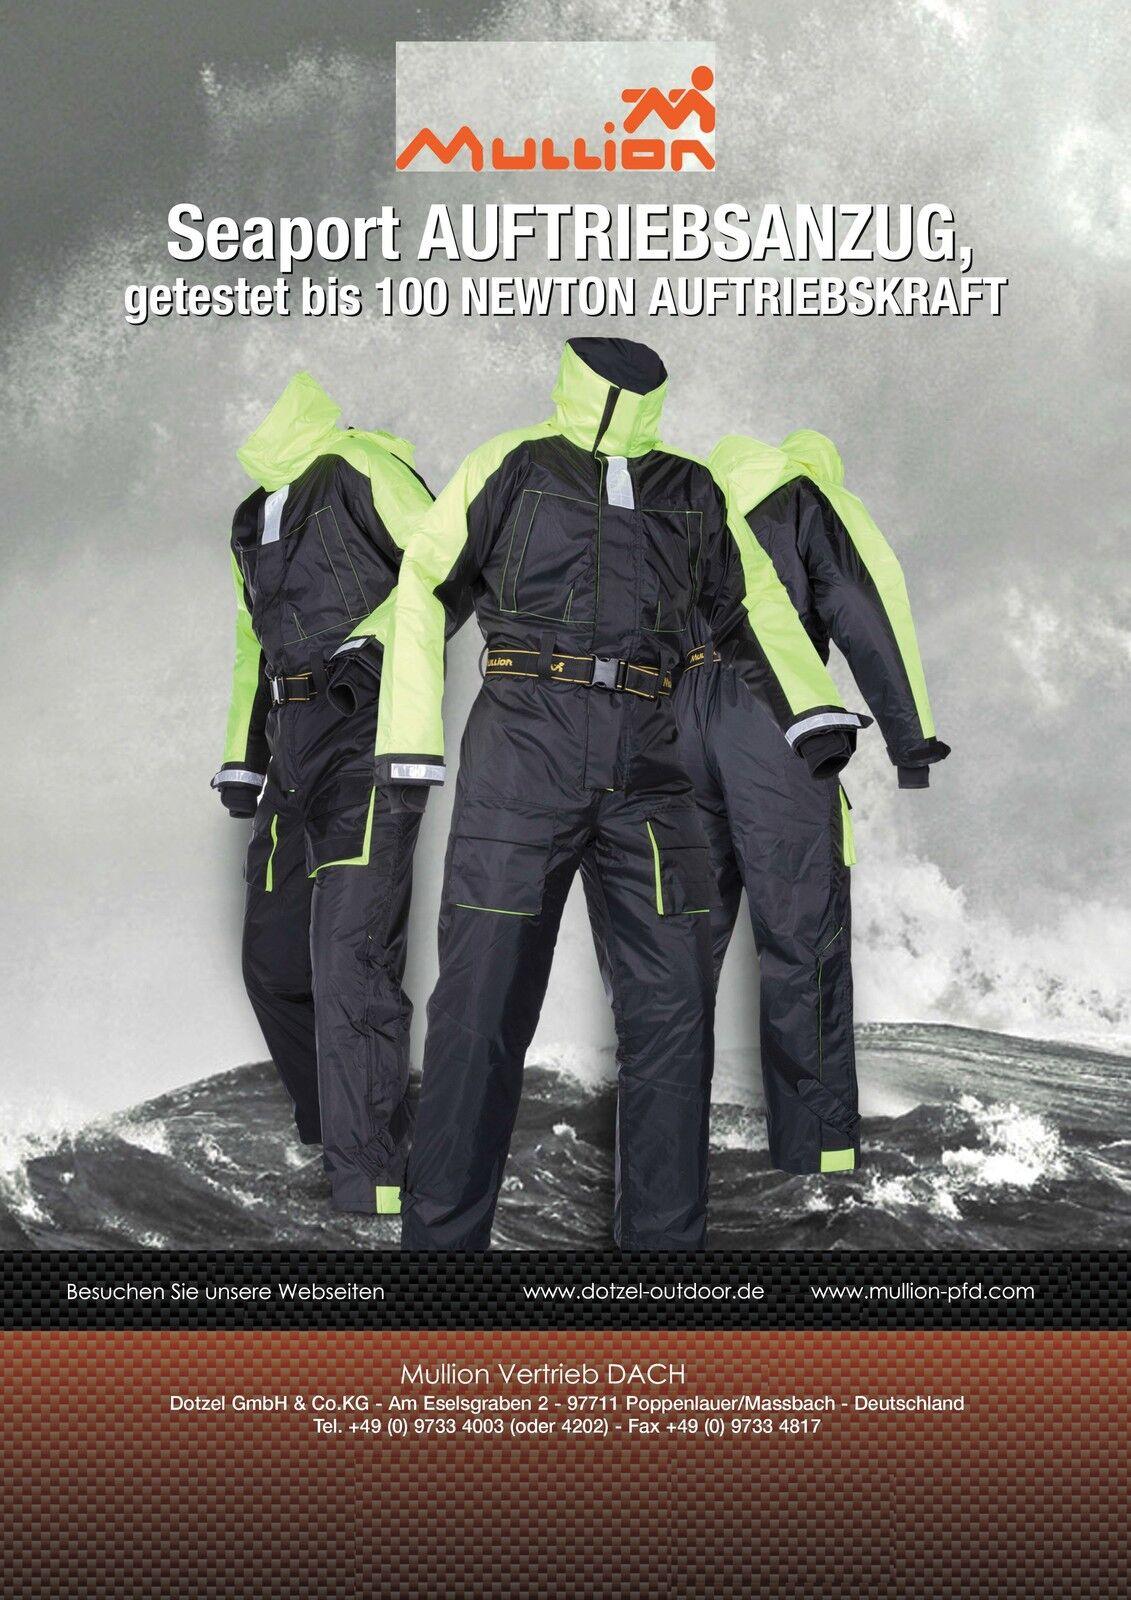 Schwimmanzug, Floatinganzug MULLION  Seaport  1MHE - Überlebensanzug, Floater